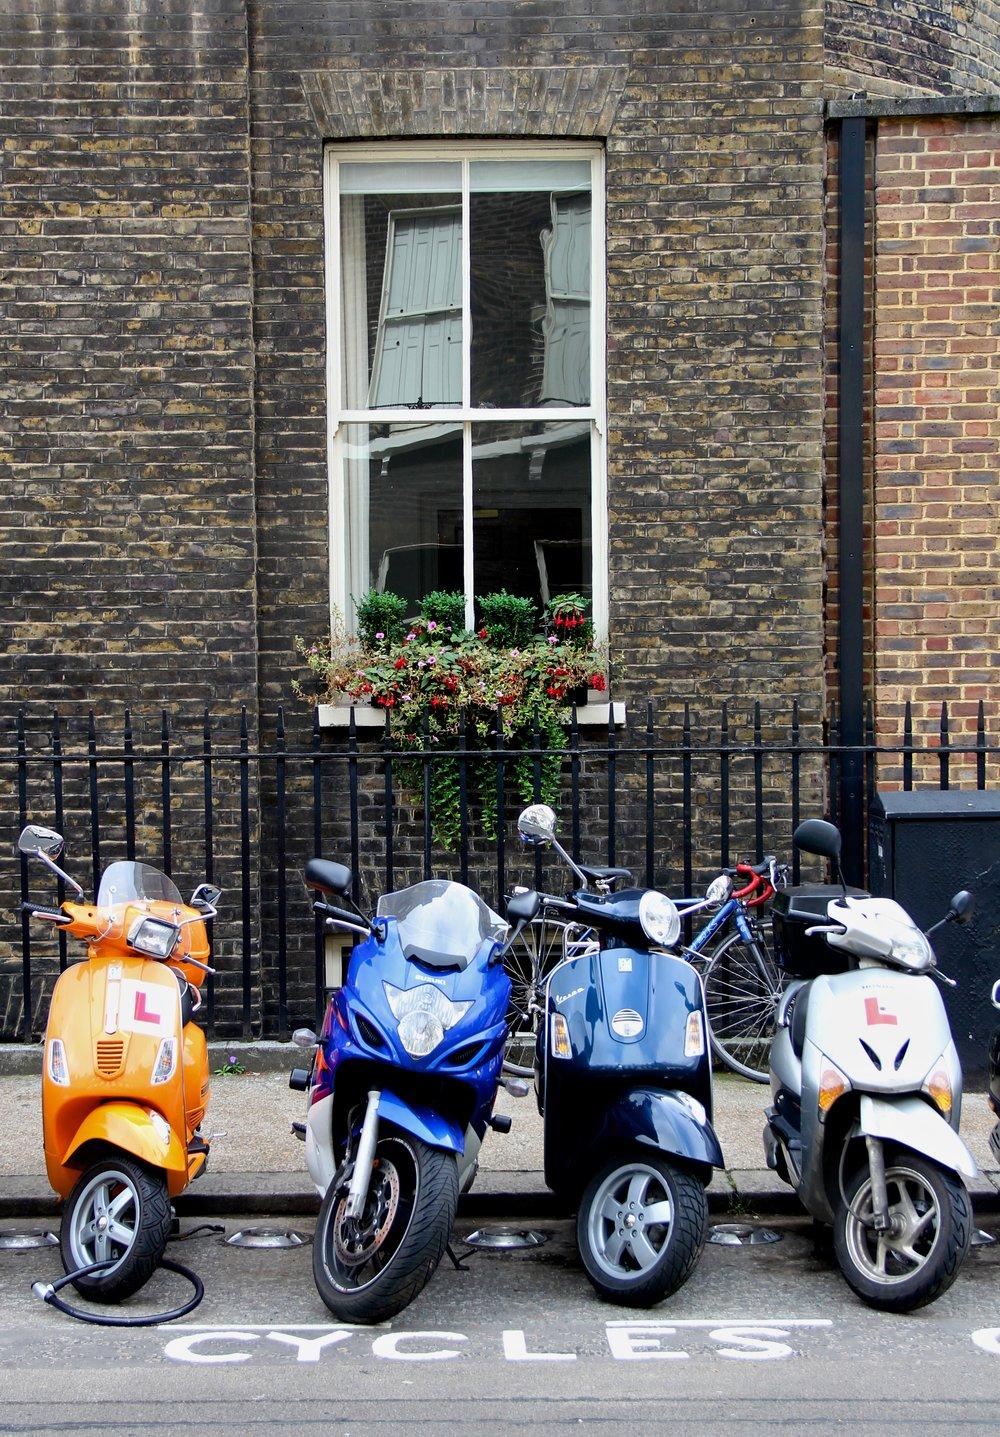 2016.09 London Edited 8109.jpg